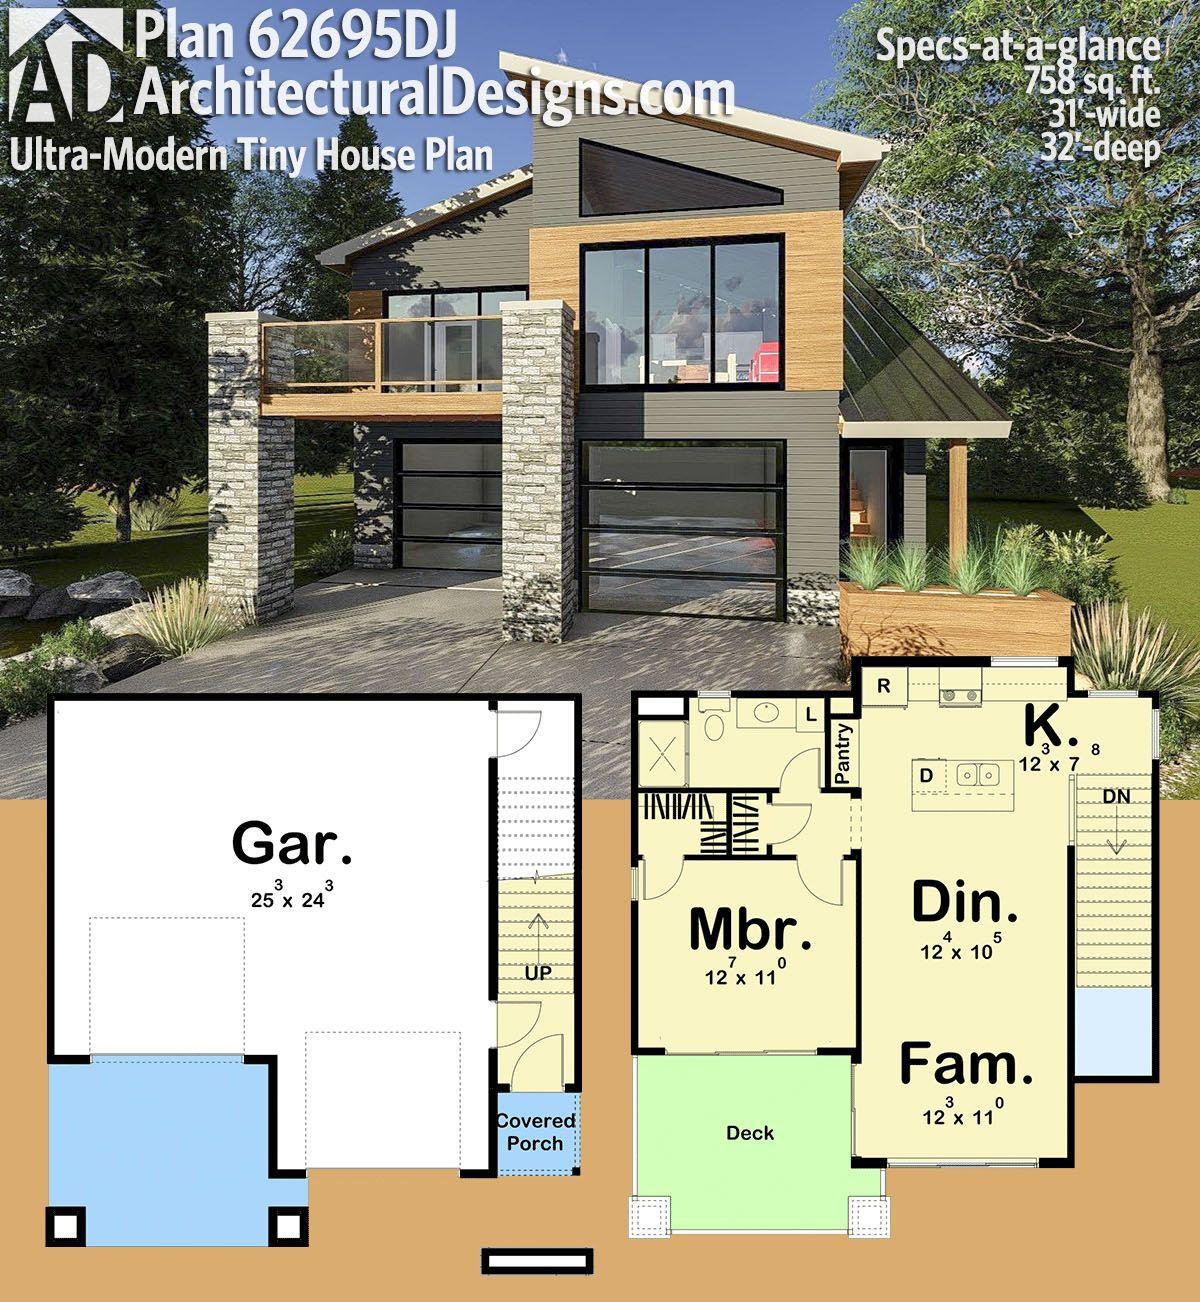 Plan 62695dj ultra modern tiny house plan modern tiny for Modern tiny house plans